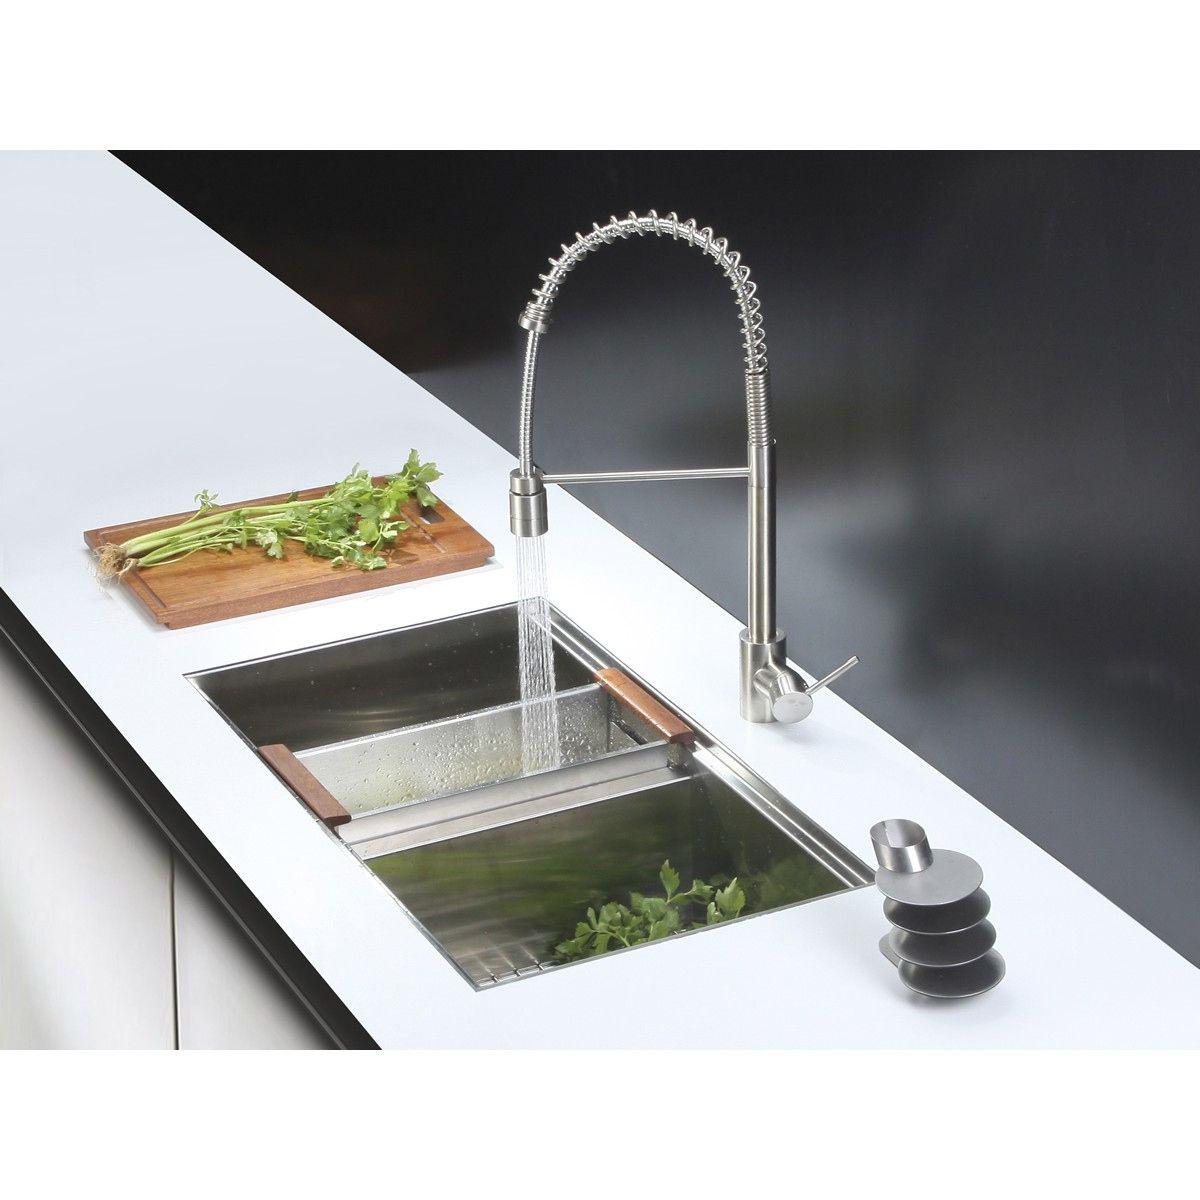 My Kitchen Sink Stinks - Rustic Kitchen Decorating Ideas Check ...